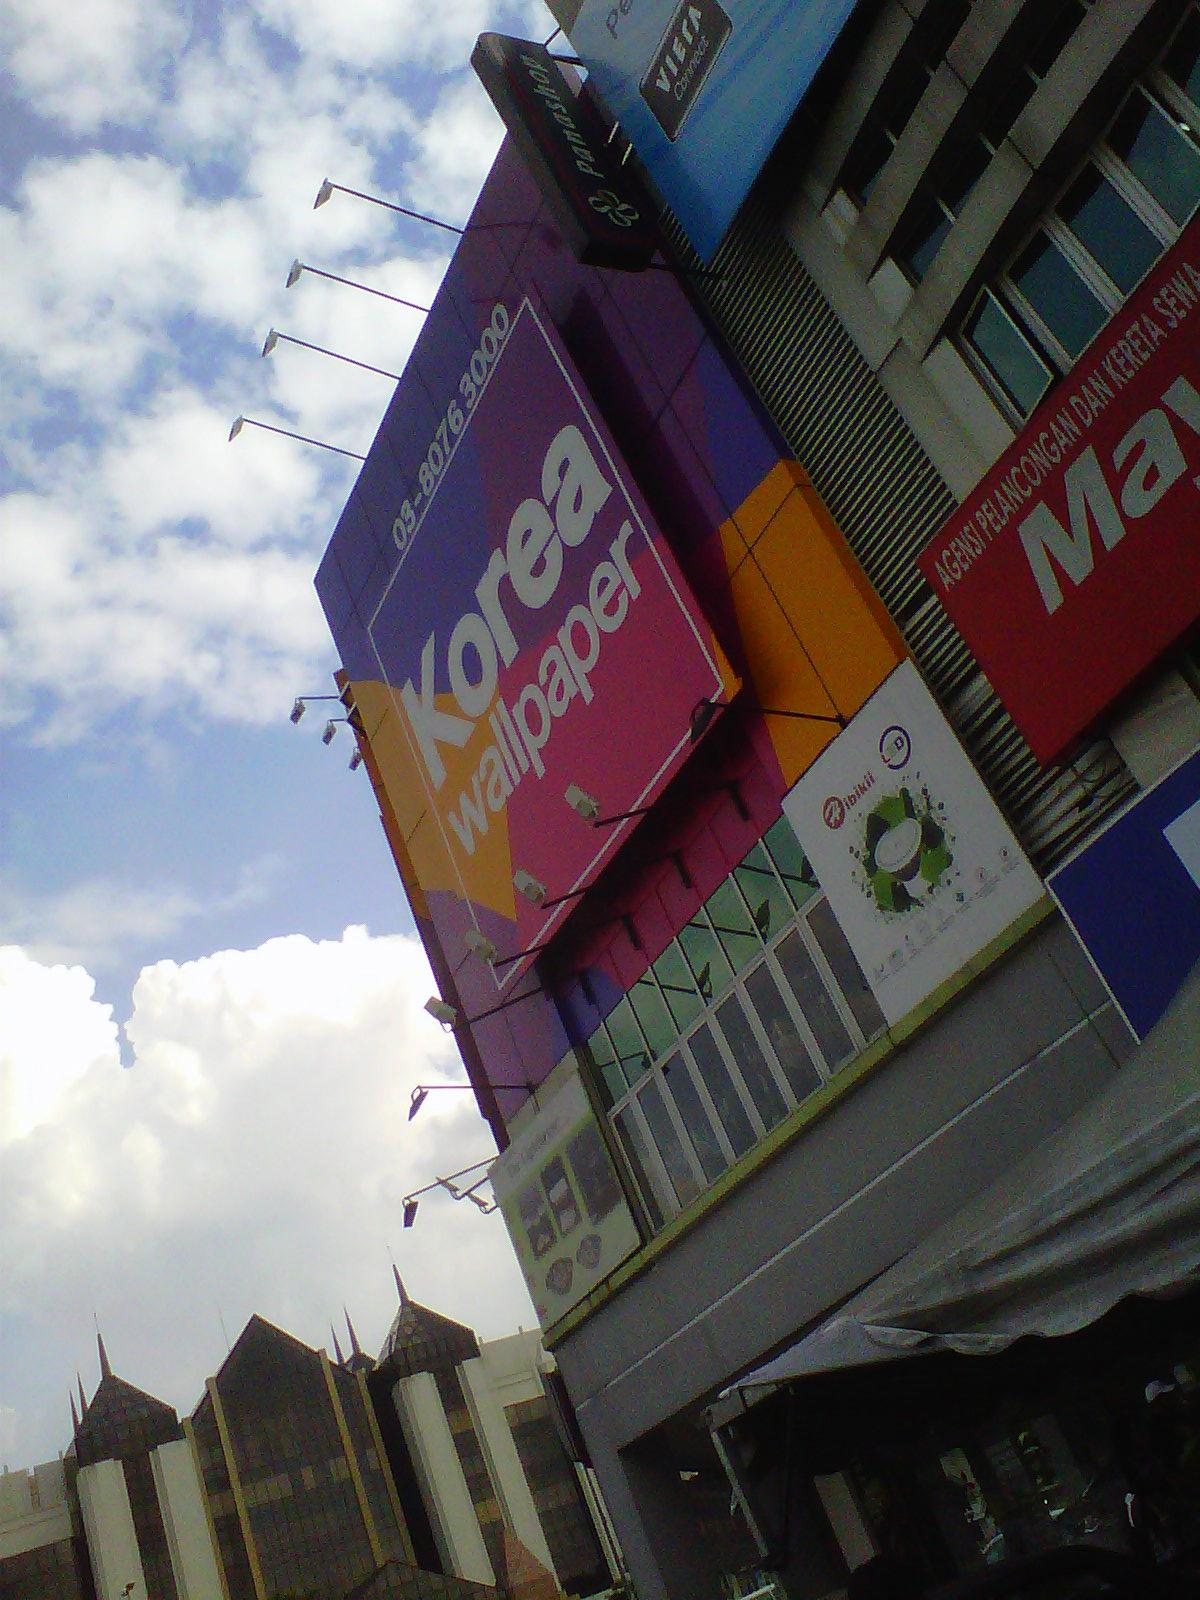 http://3.bp.blogspot.com/-1UnWyddttIk/TwT_NNSEMXI/AAAAAAAAFjc/ikKQWzJFL0k/s1600/Damansara-20120101-01319.jpg